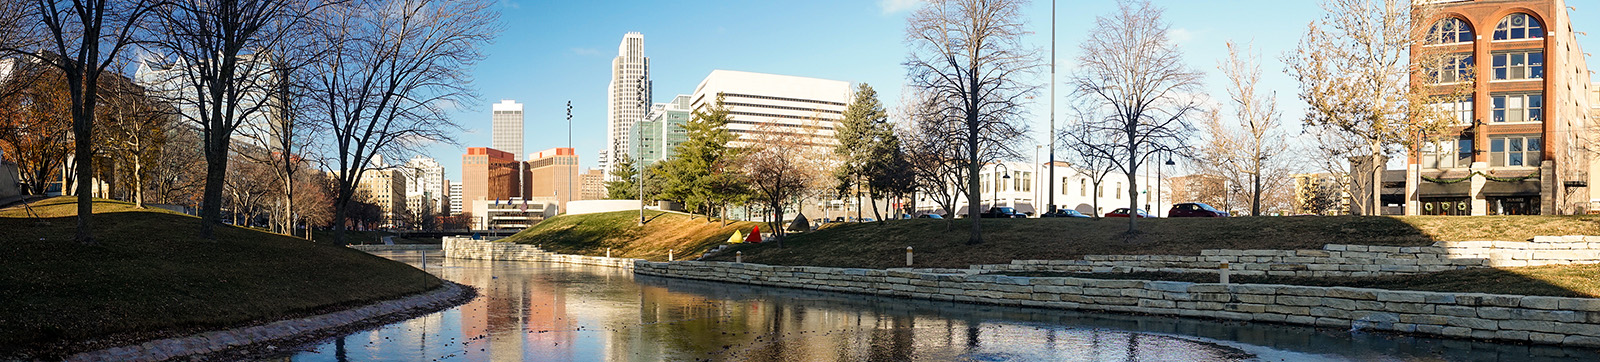 Riverfront buildings, art, bridges and architecture of Omaha, Nebraska